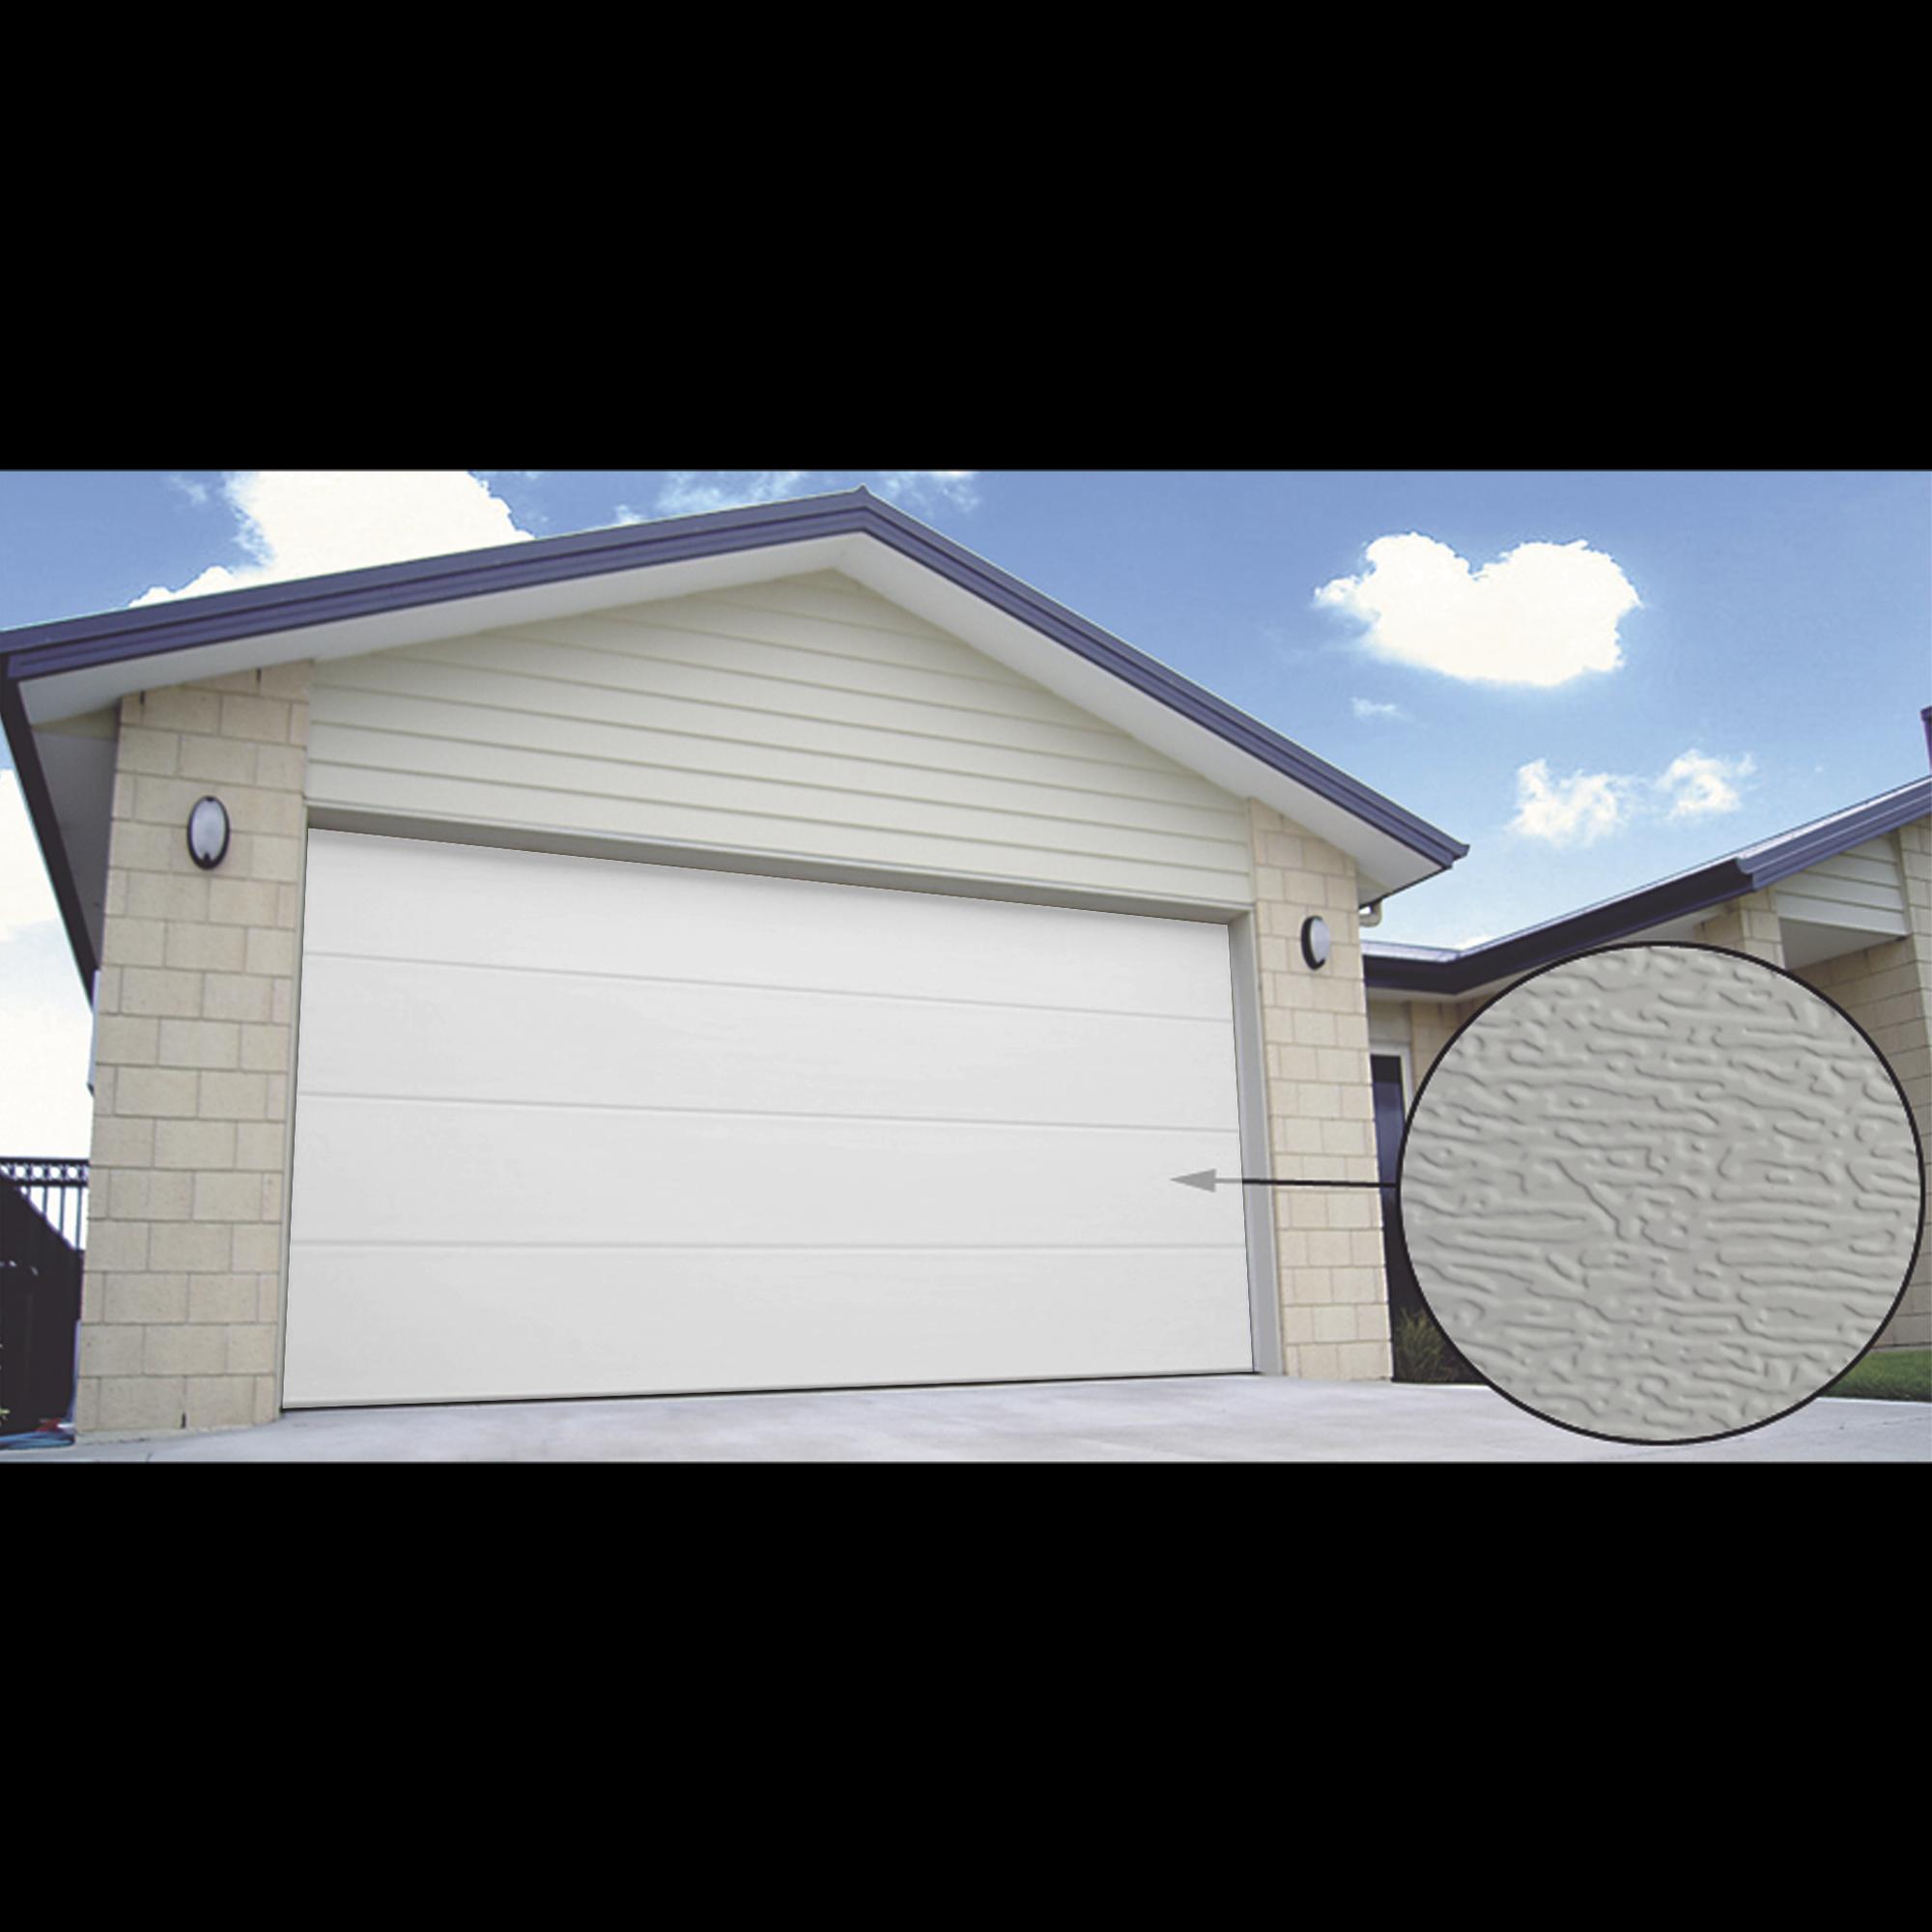 Puerta de Garage PREMIUM, Lisa color blanco 10X8 FT,  AISLADA, Estilo U.S.A.